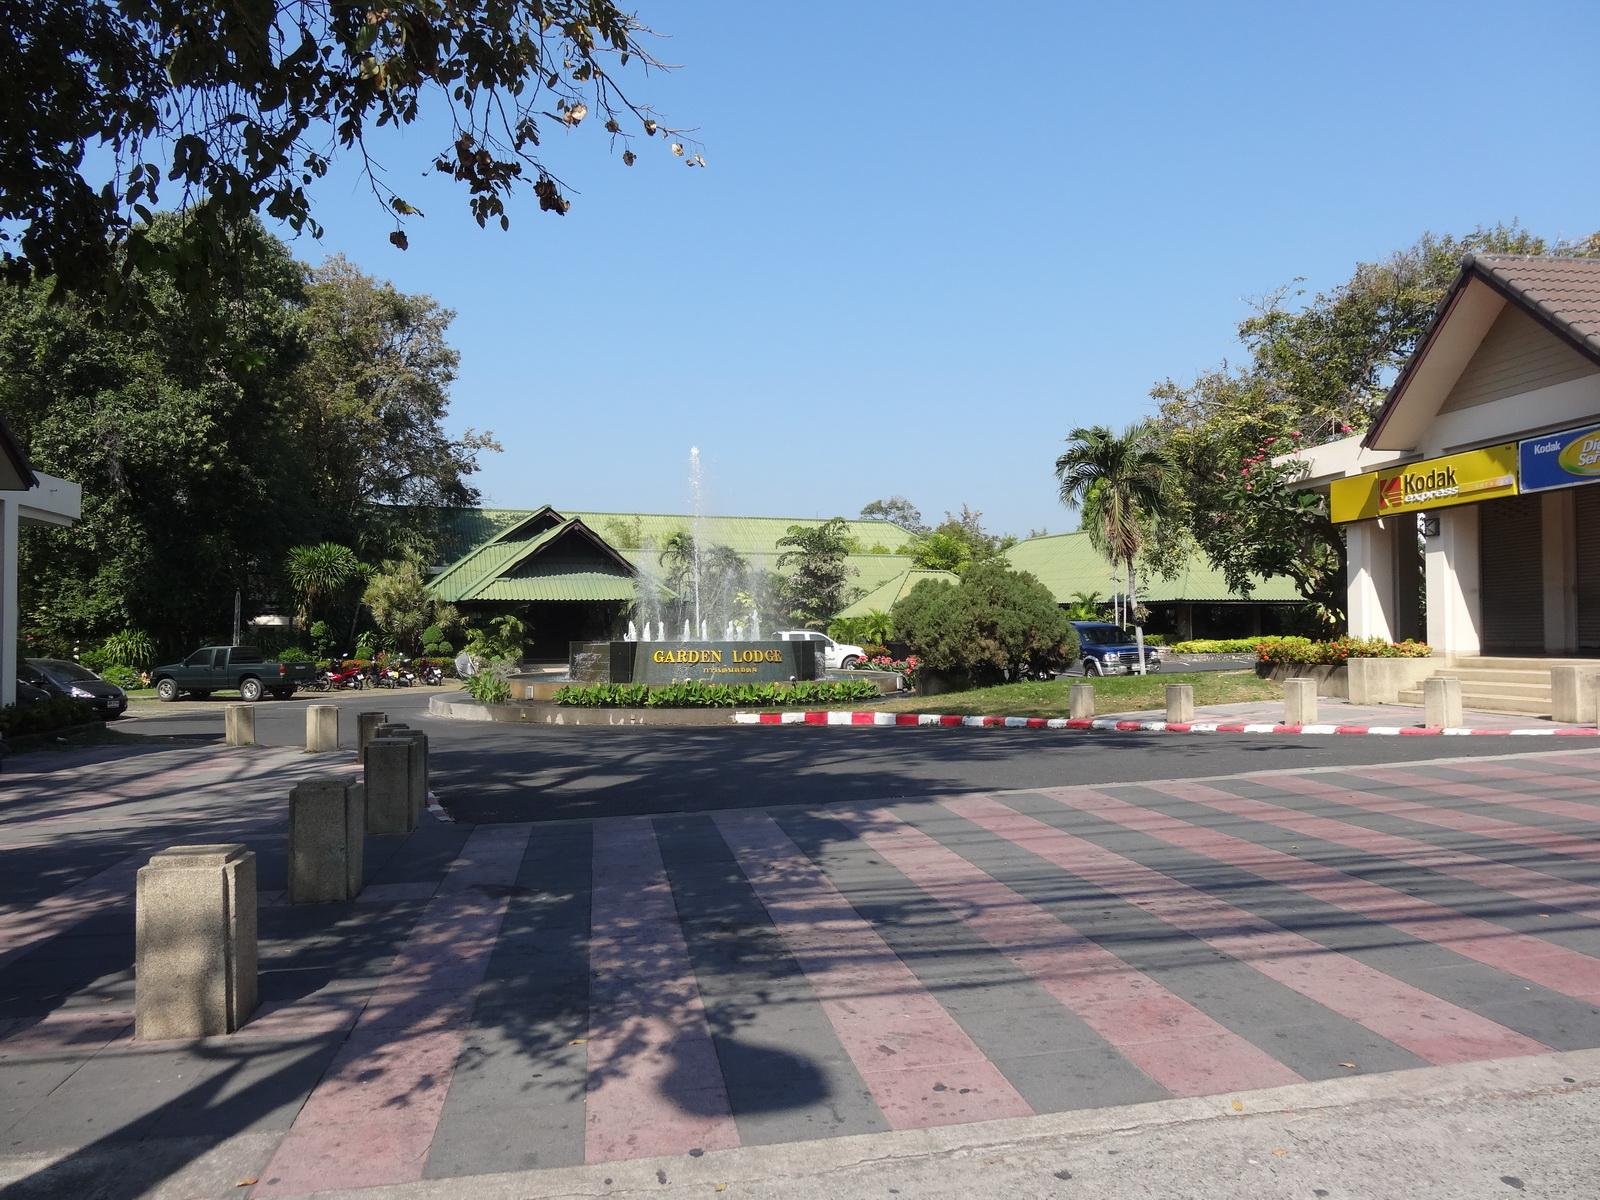 20 Pattaya 385